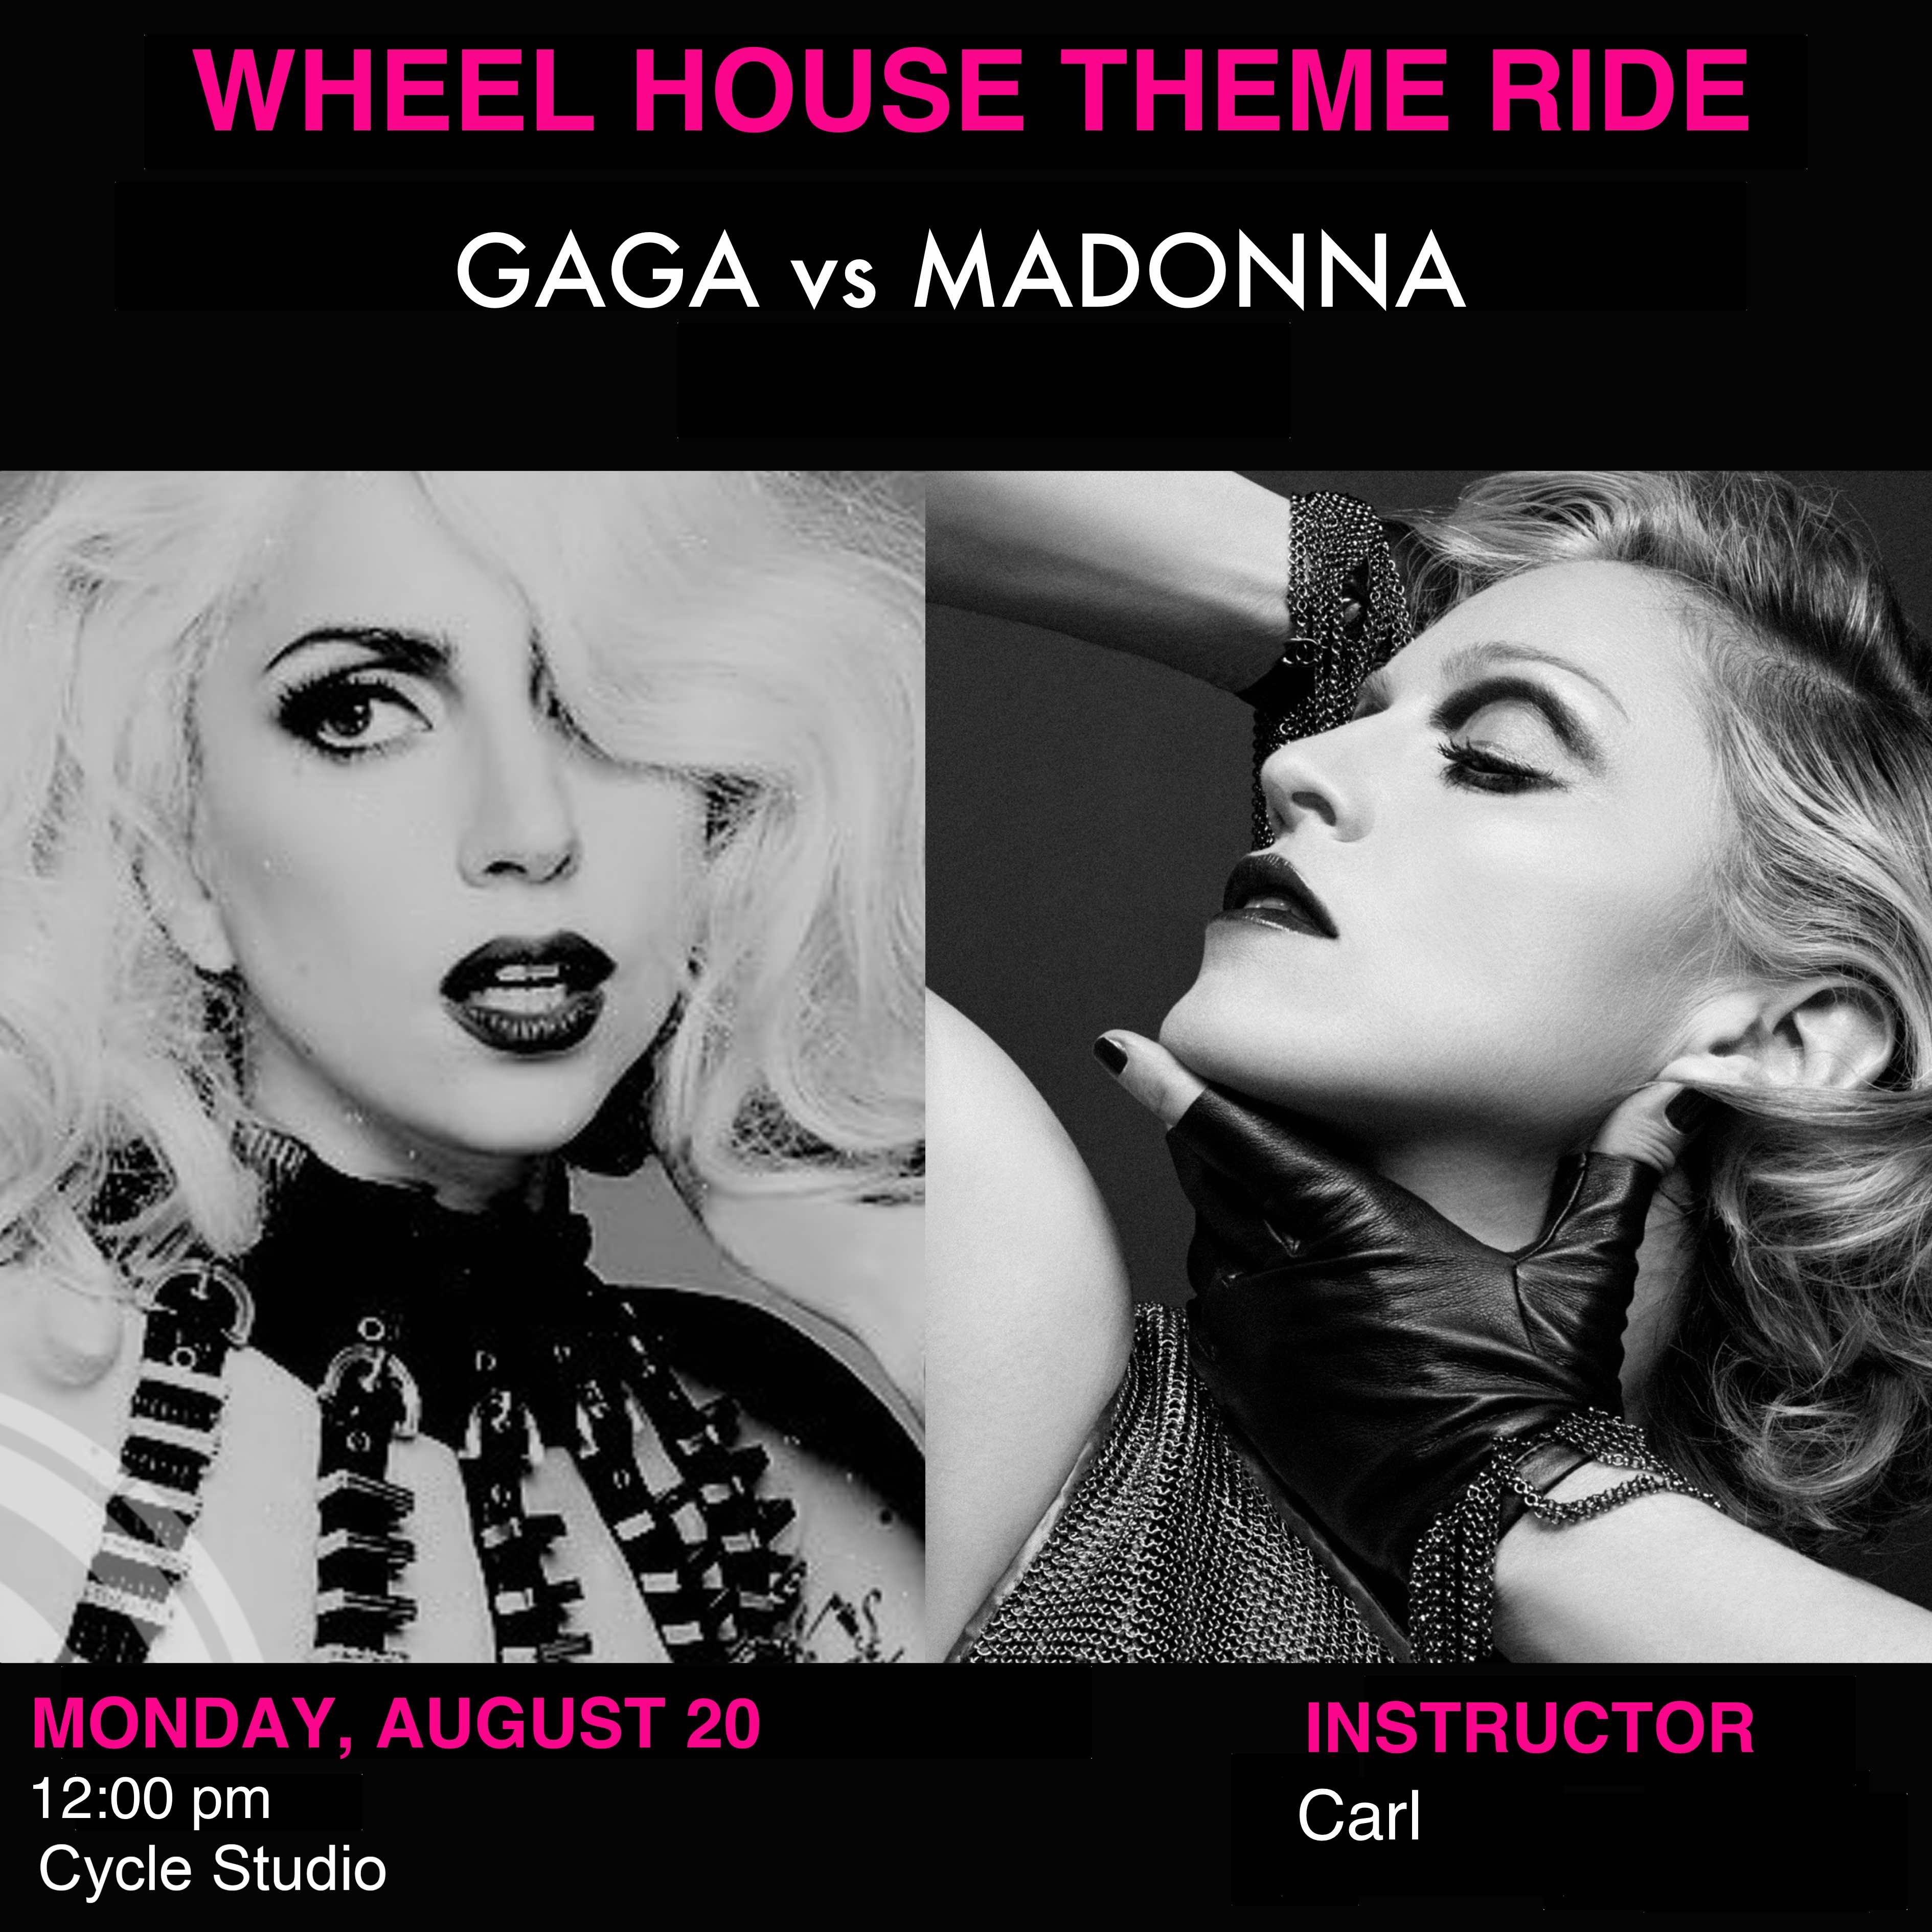 Gaga vs Madonna